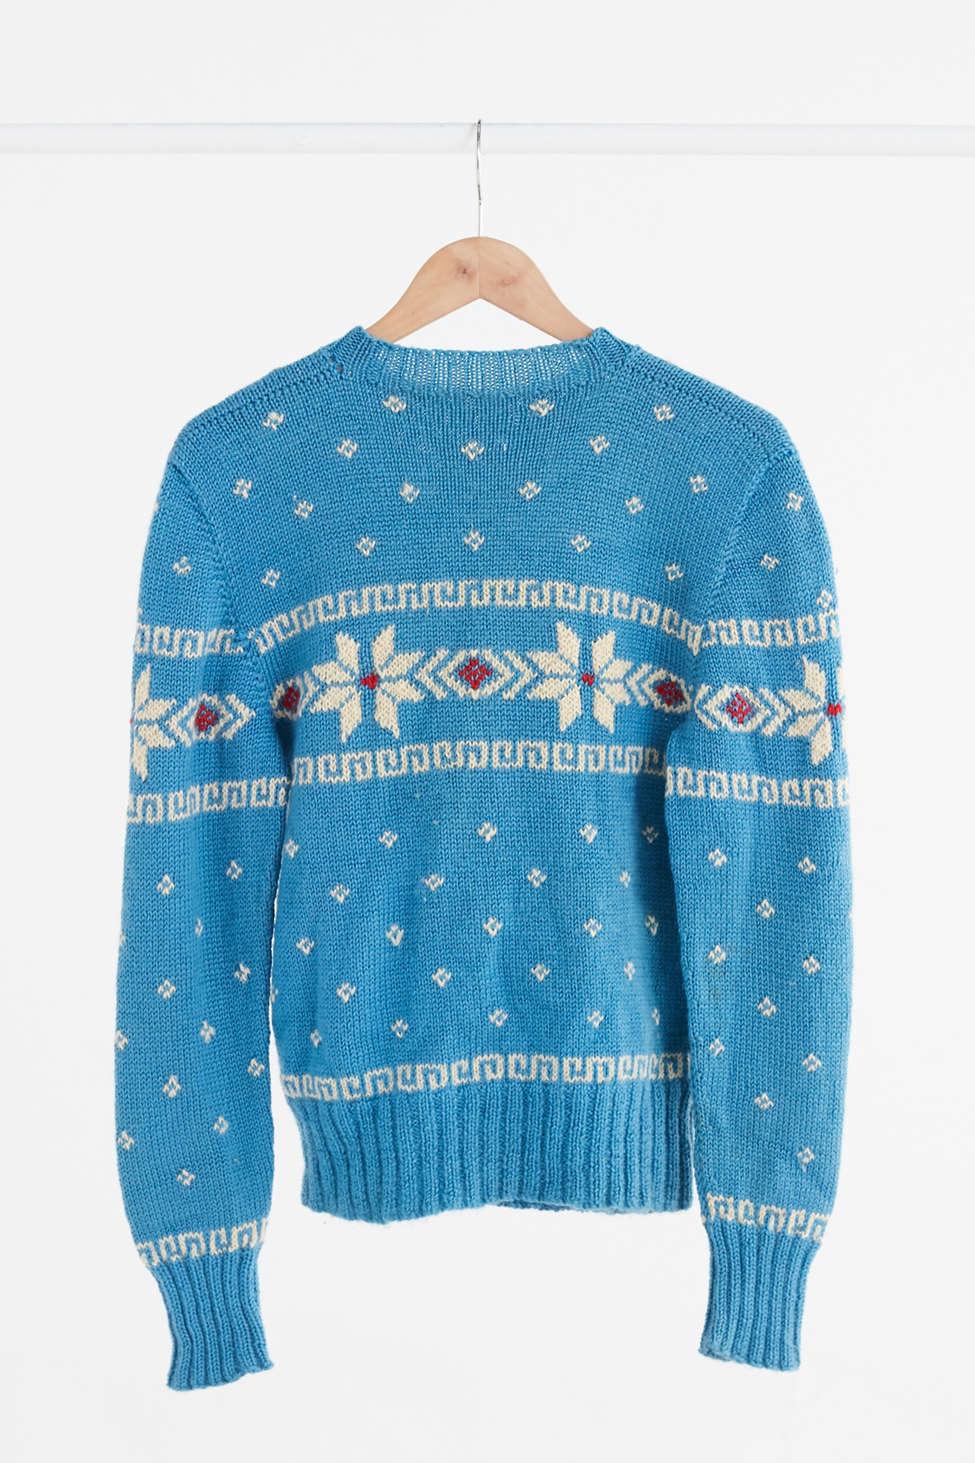 Vintage Turquoise Fair Isle Ski Sweater | Urban Outfitters Canada